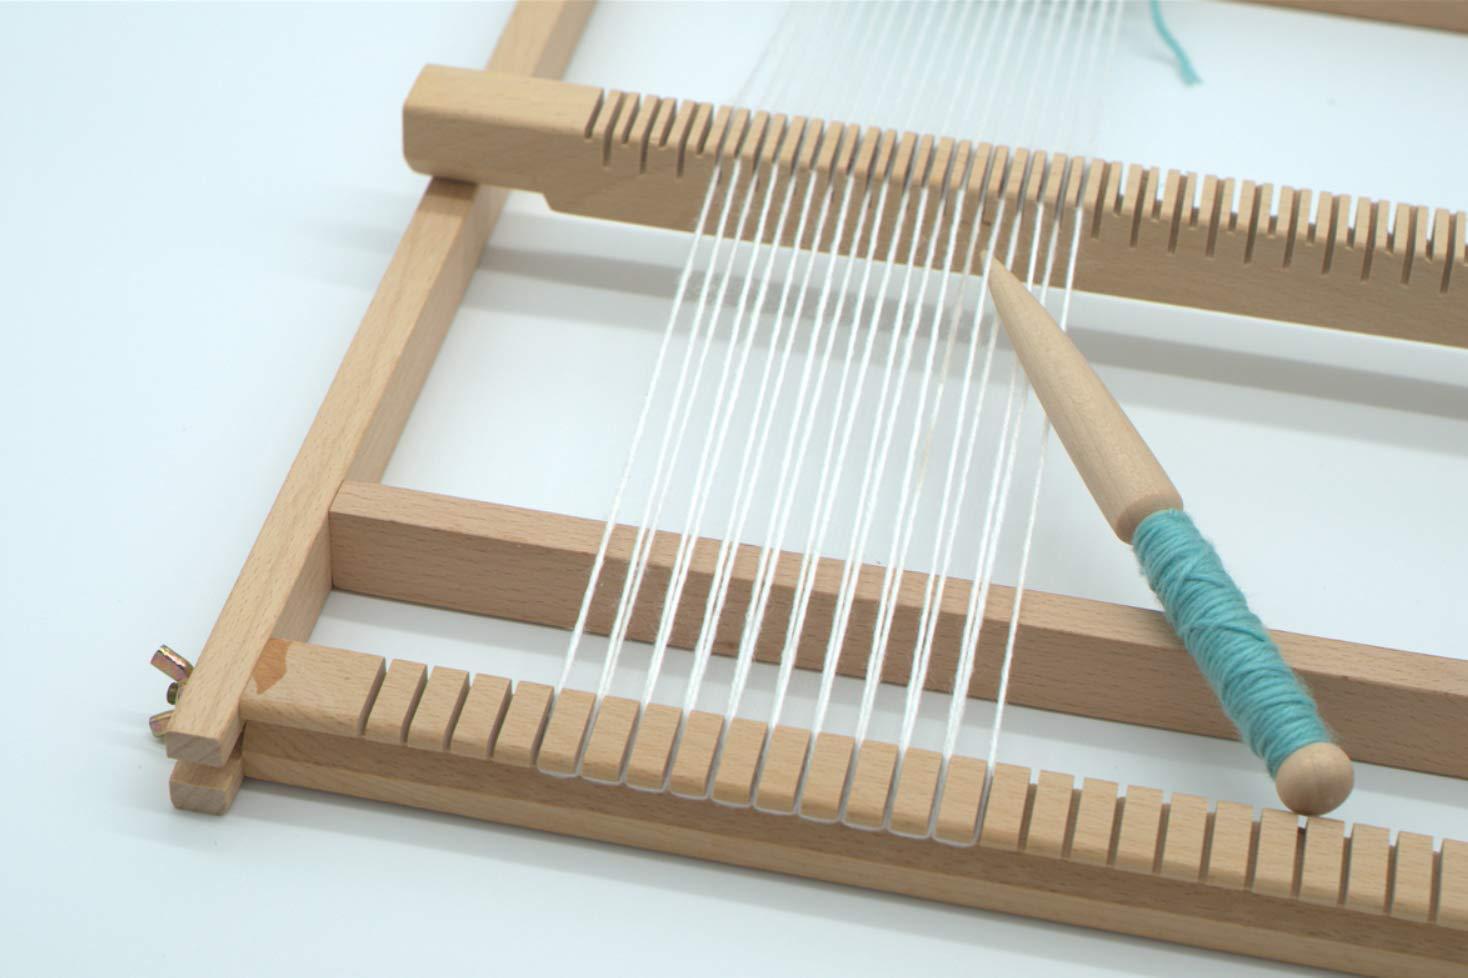 1 Pcs AROYEL Single Beech Weaving Stick Needle